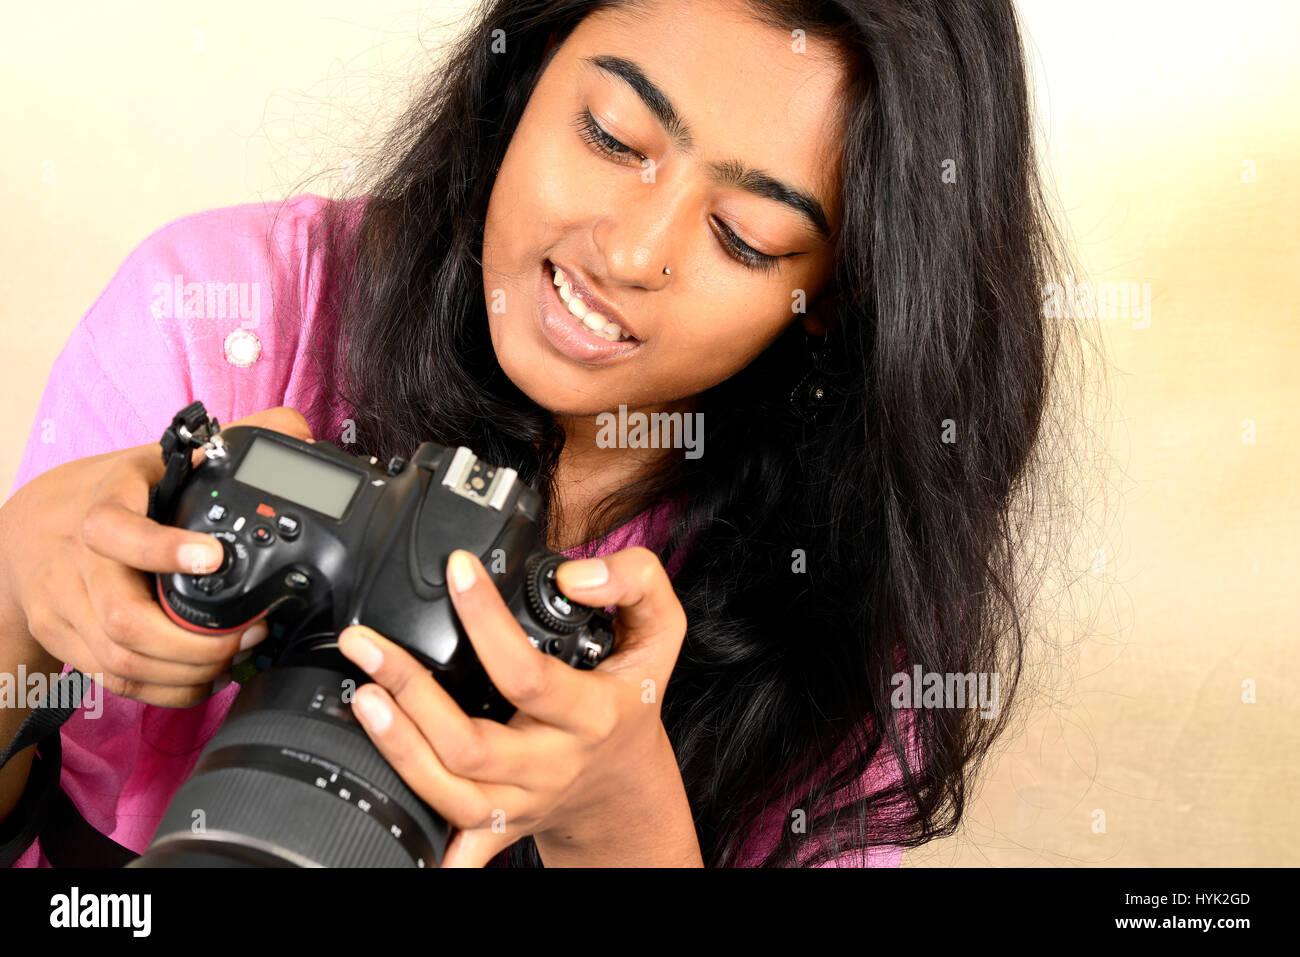 trying-out-a-new-dslr-camera-HYK2GD.jpg